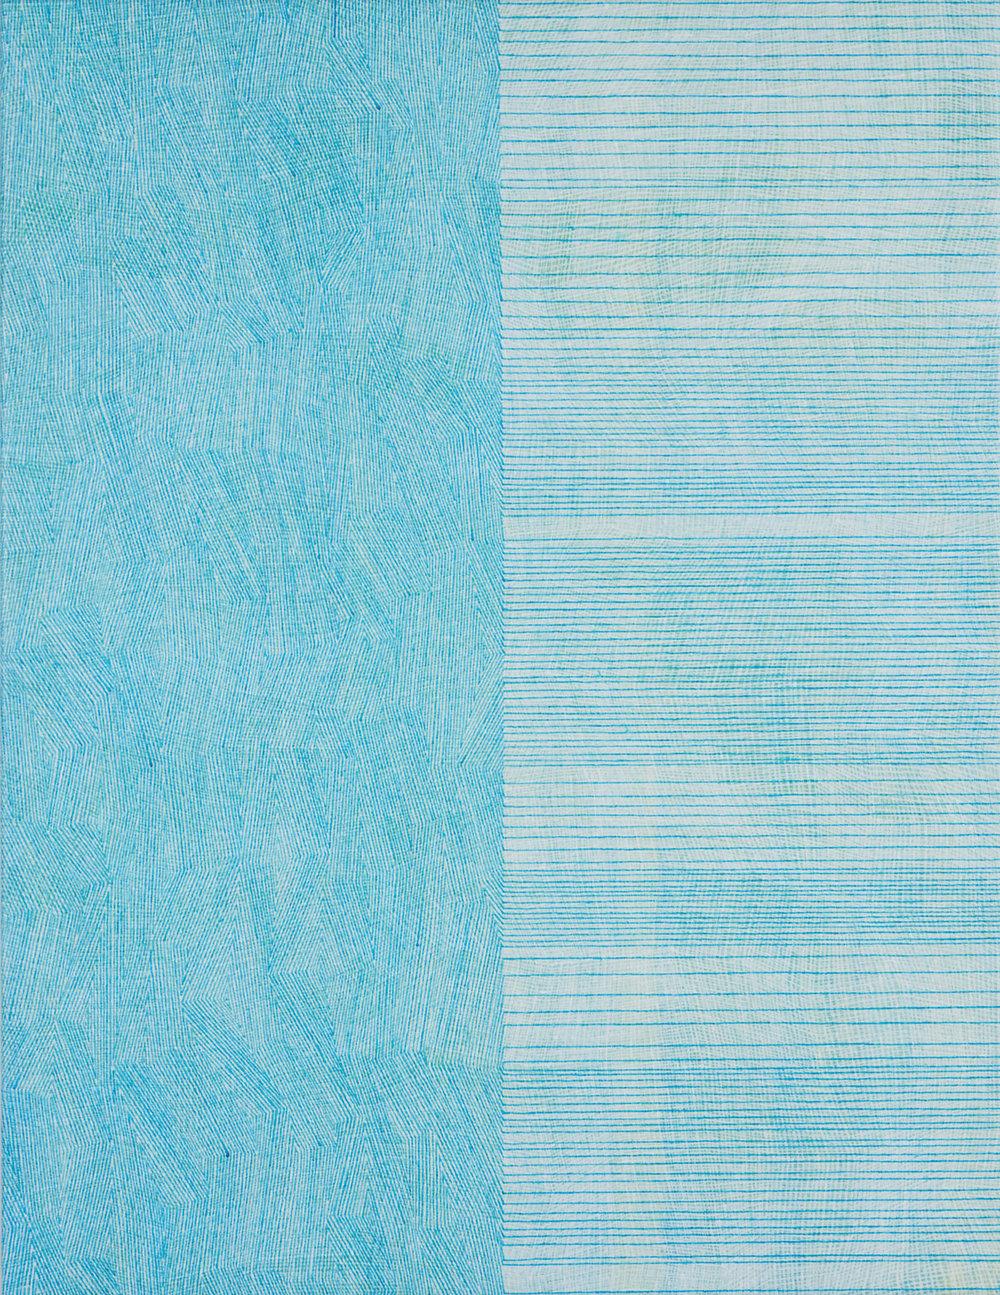 KARL WIEBKE  57-18 blue on white grid , 2018 acrylic on linen 70.5 x 54 cm